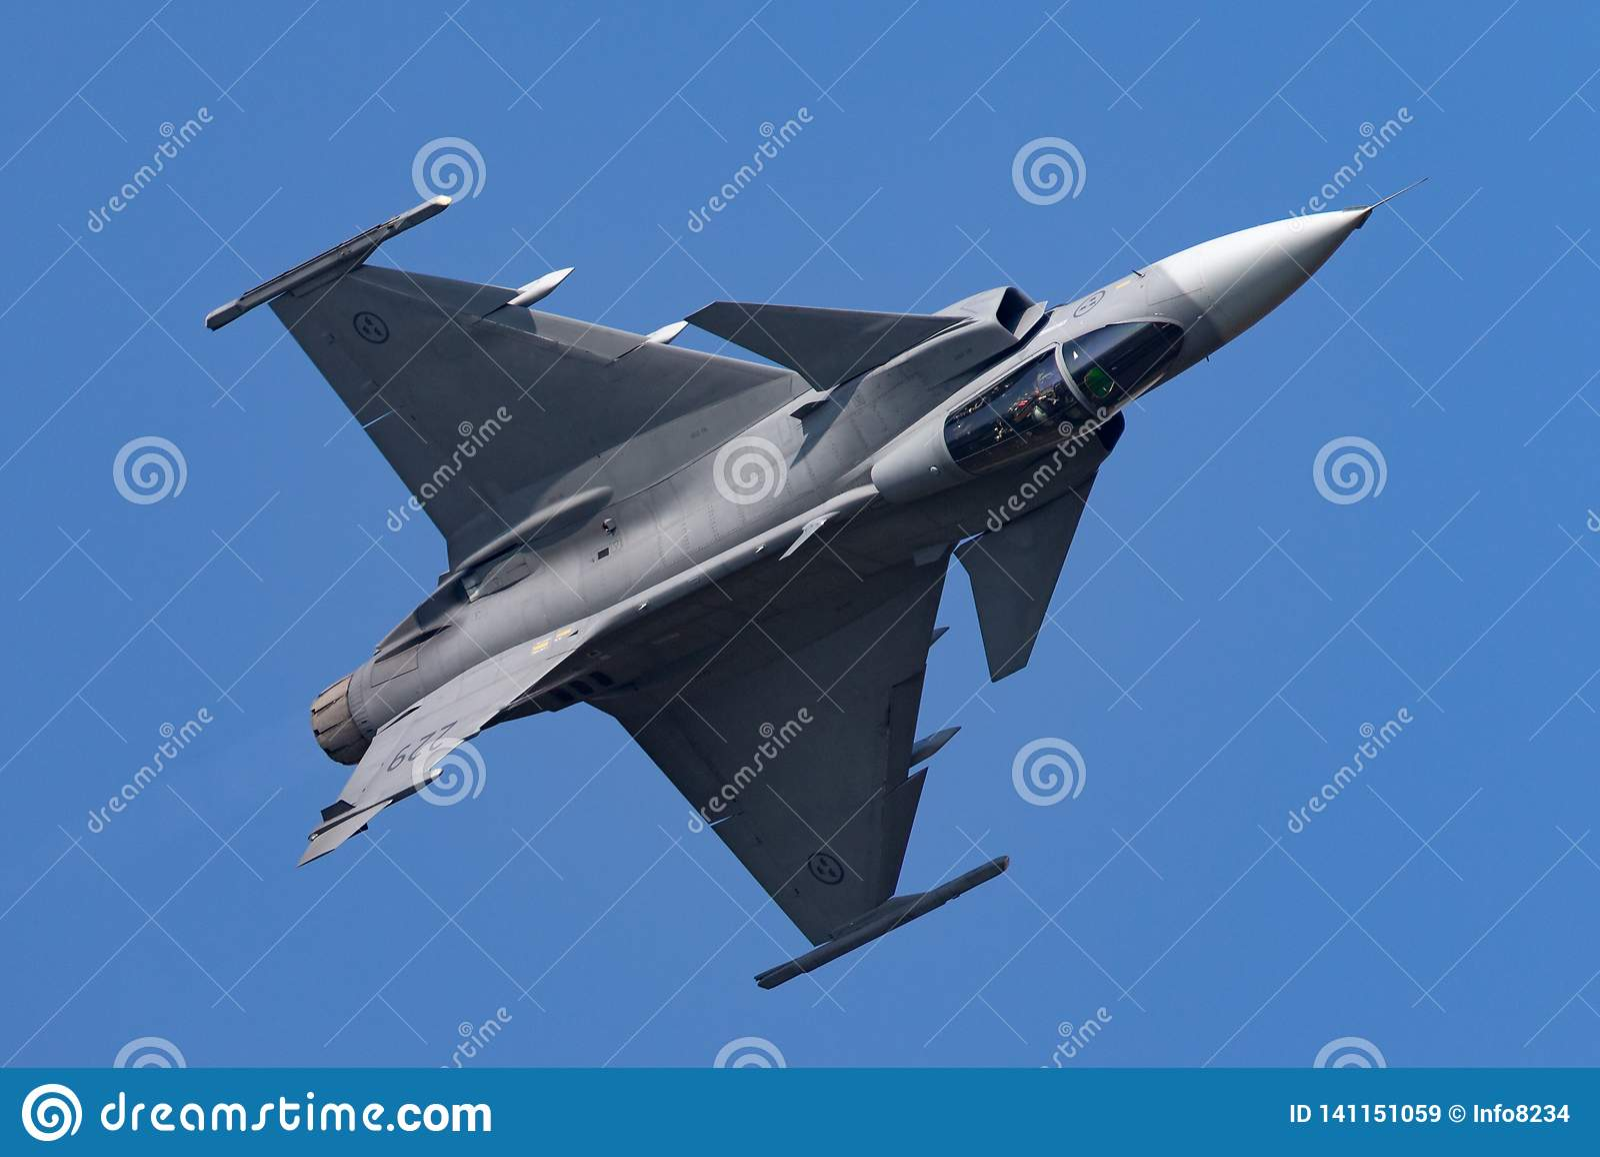 Swedish Air Force Saab JAS-39C Gripen Multirole Fighter Aircraft